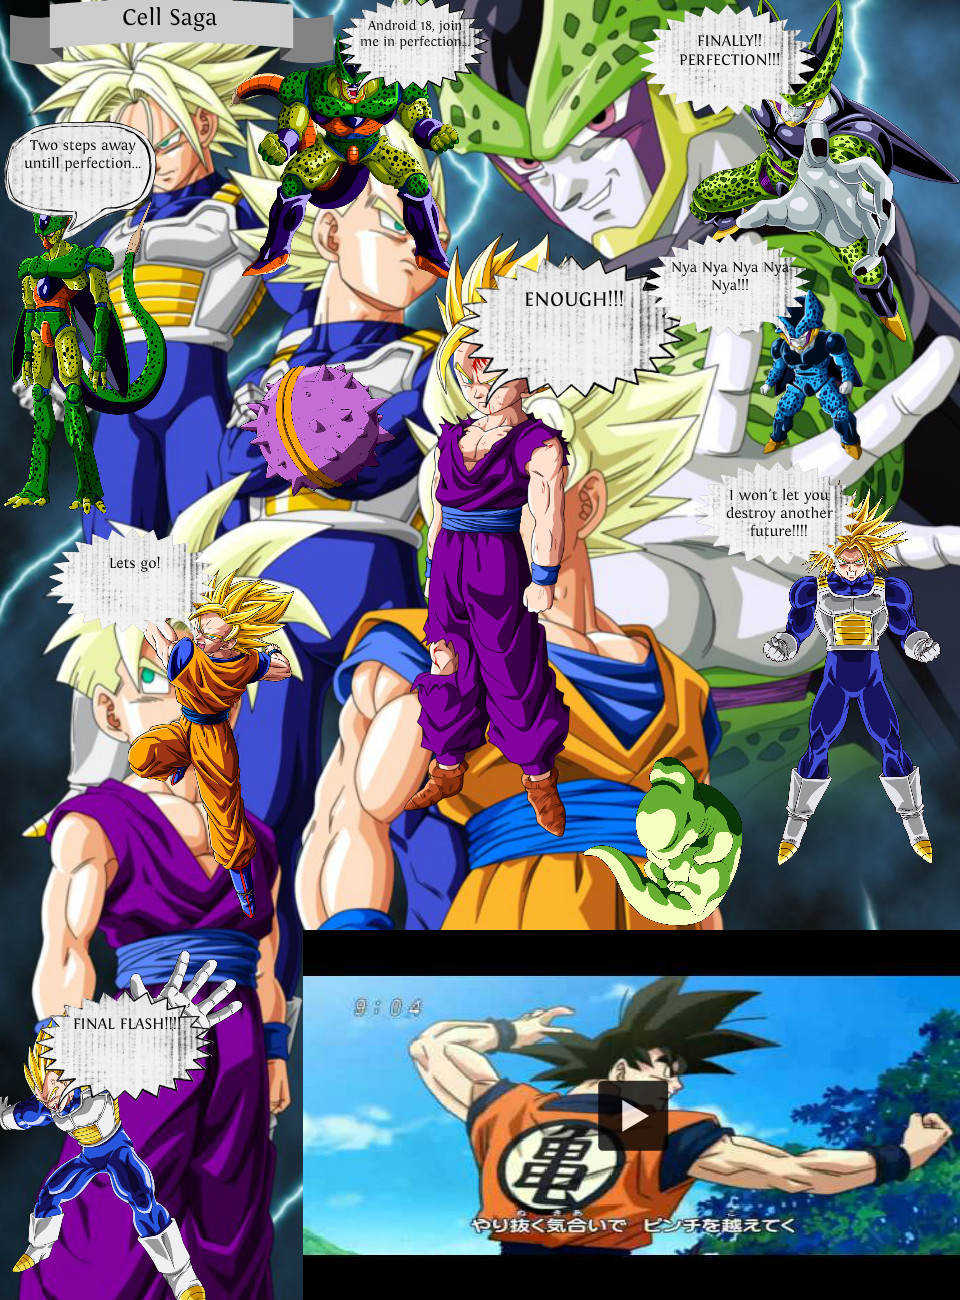 Cell Saga Th Saga In Dragon Ball Z Source